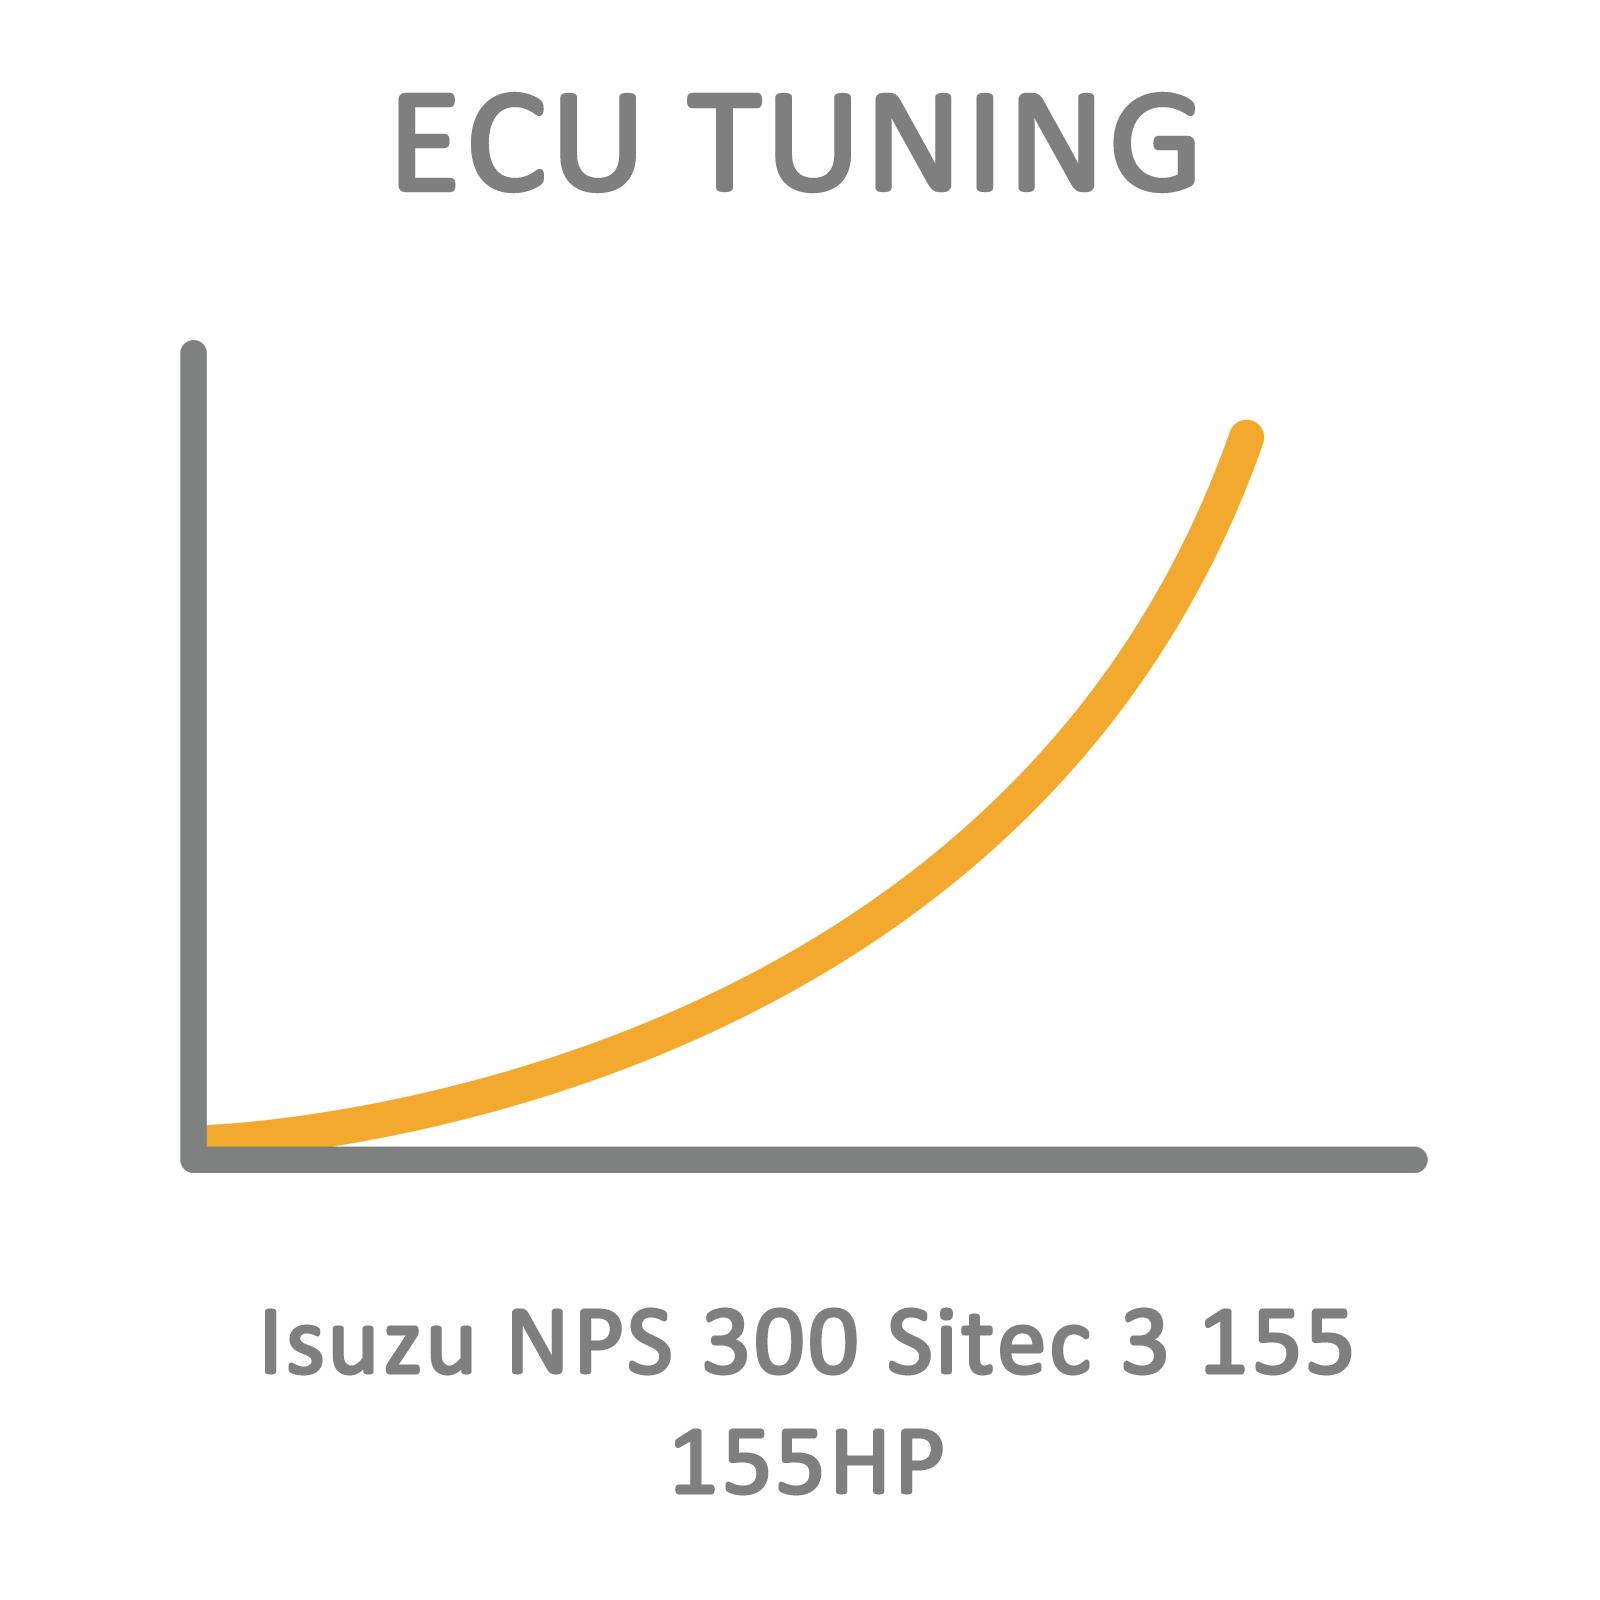 Isuzu NPS 300 Sitec 3 155 155HP ECU Tuning Remapping